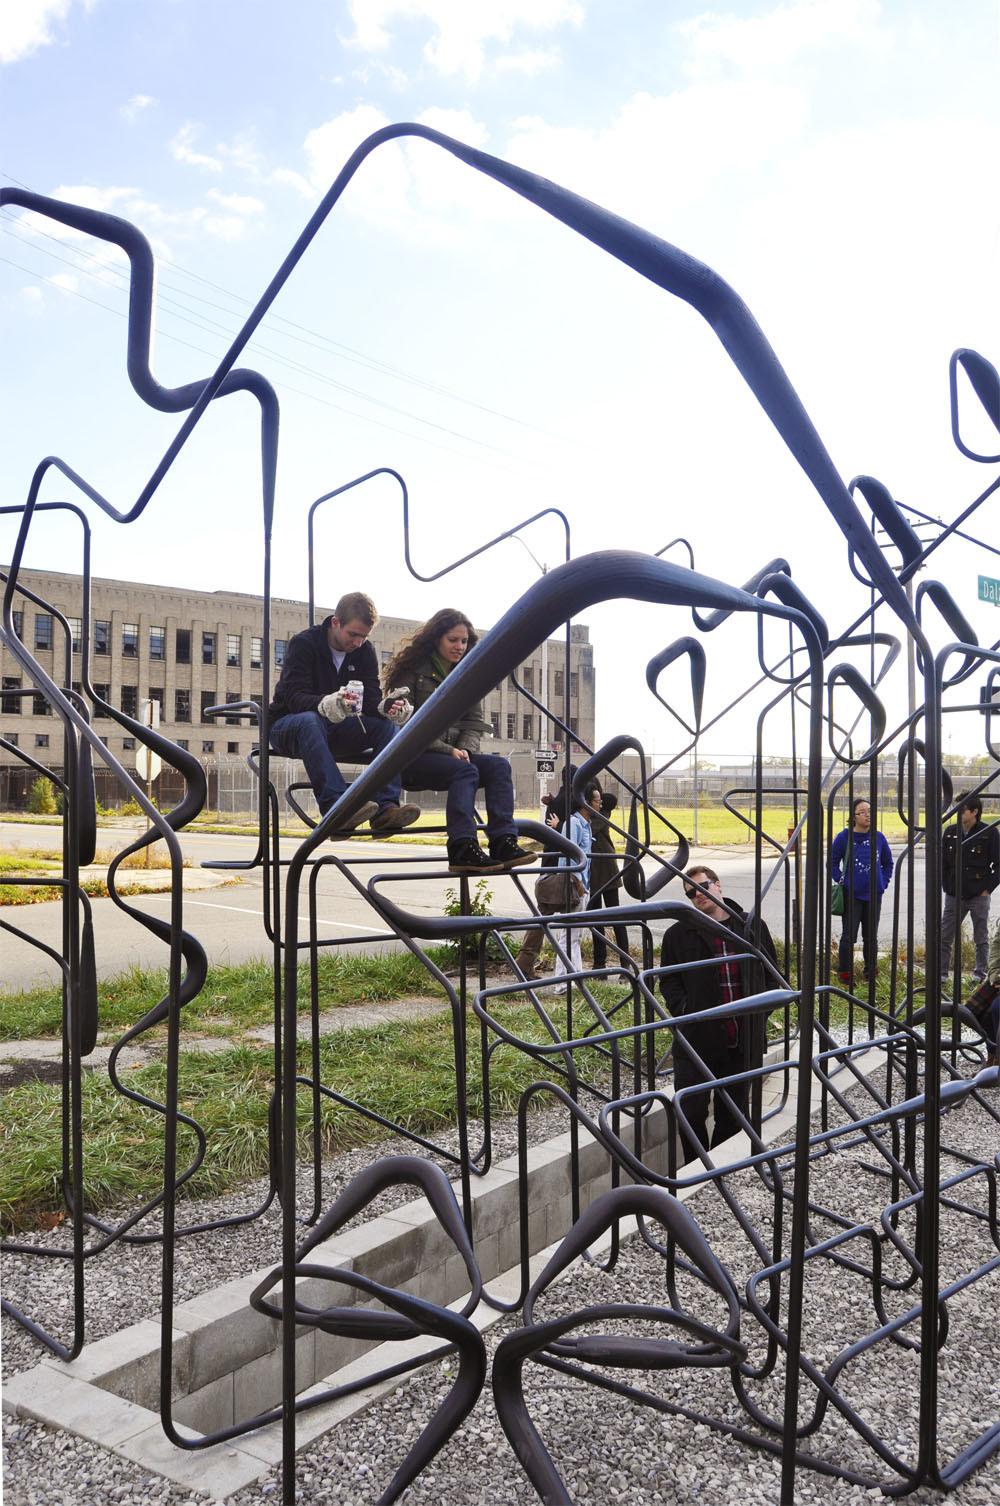 The pavilion occupied